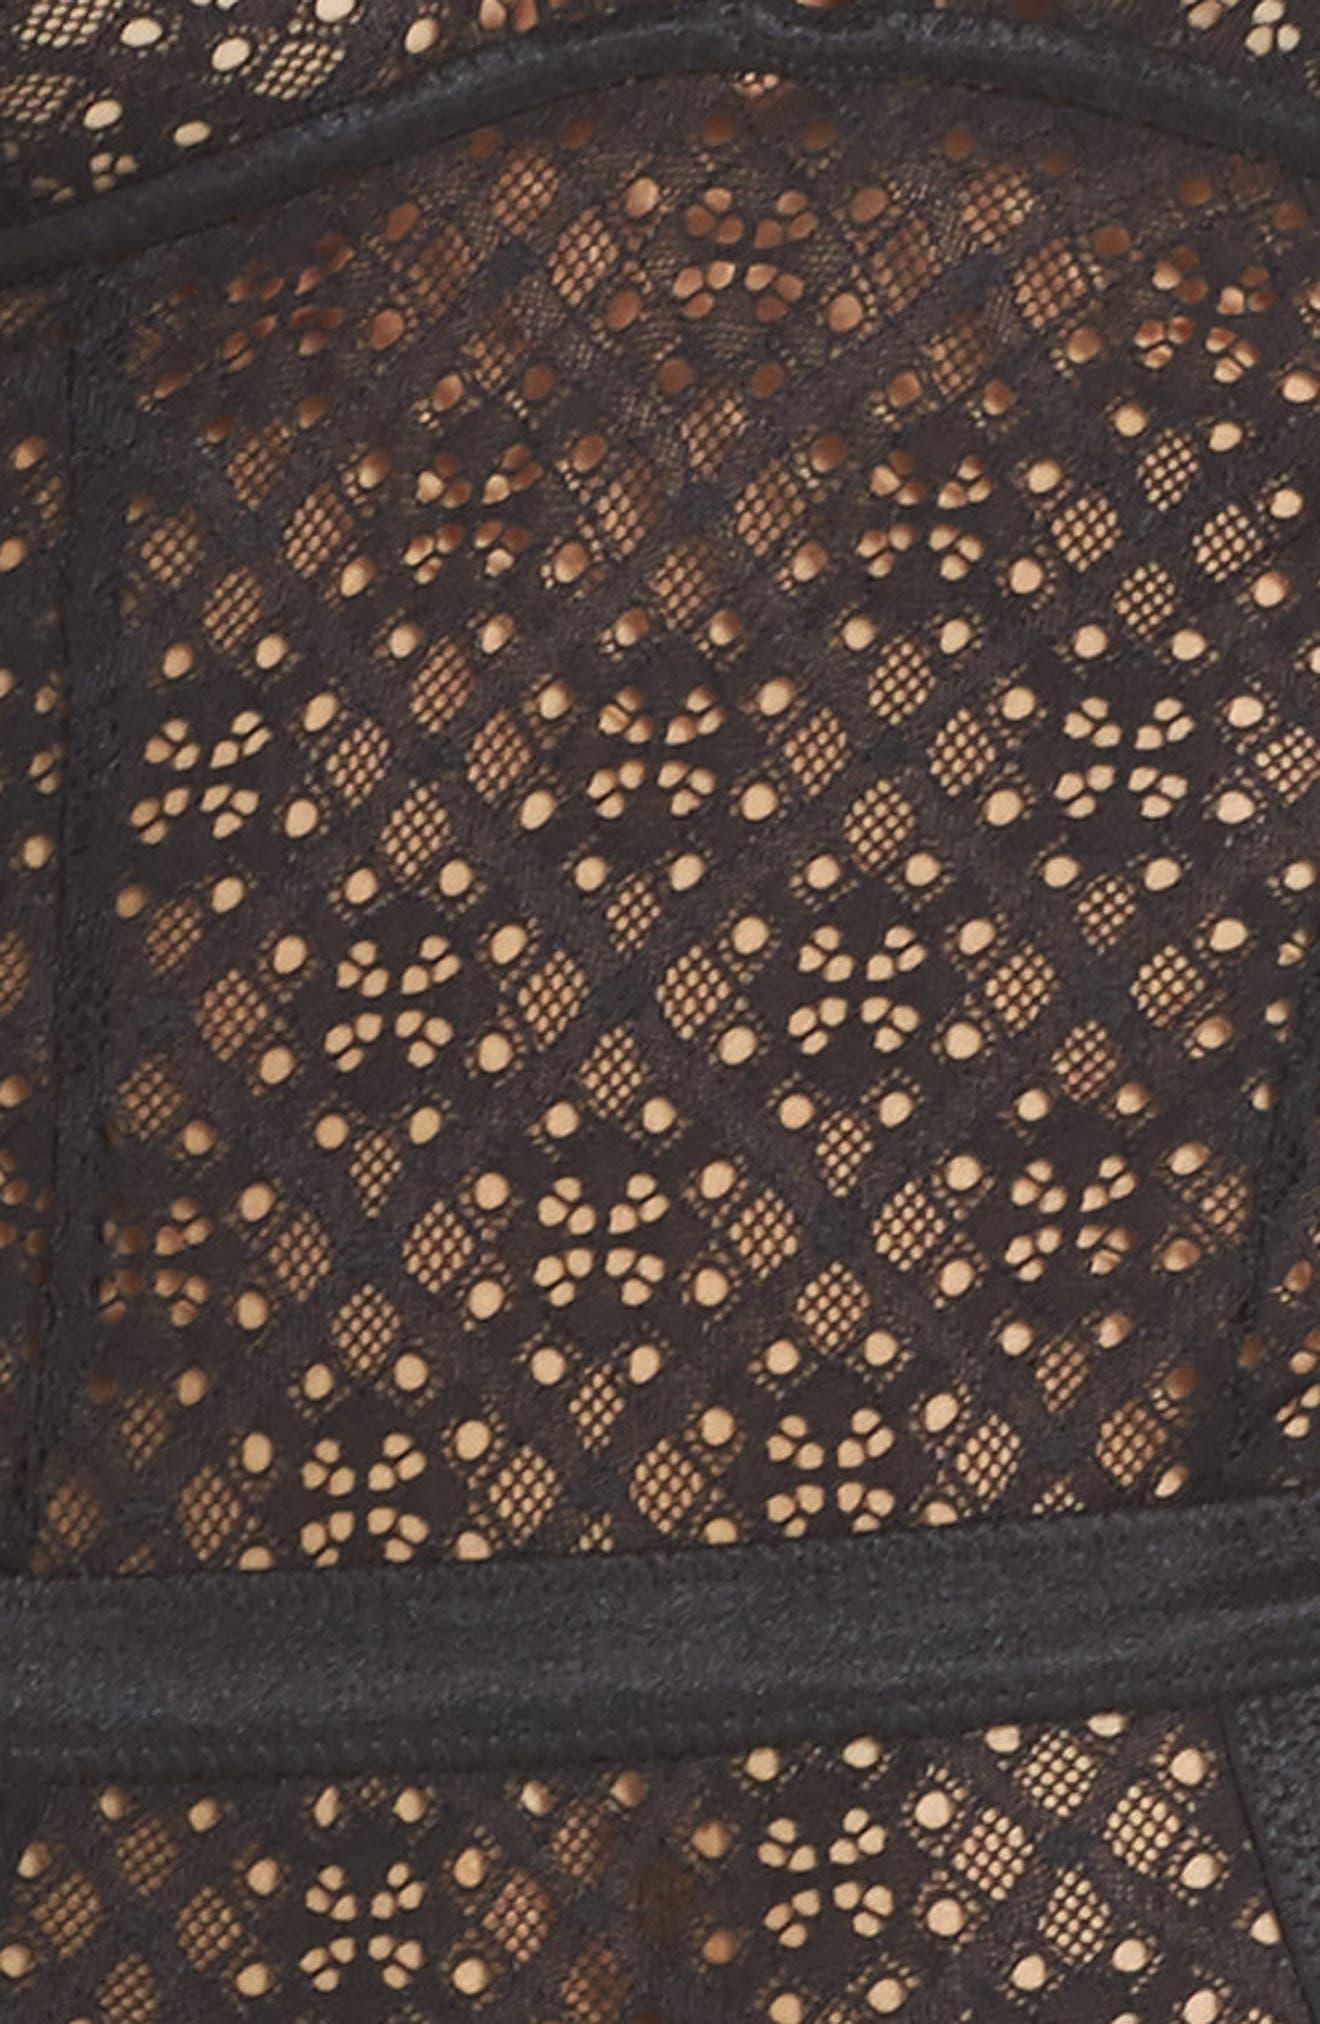 Thong Bodysuit,                             Alternate thumbnail 5, color,                             001